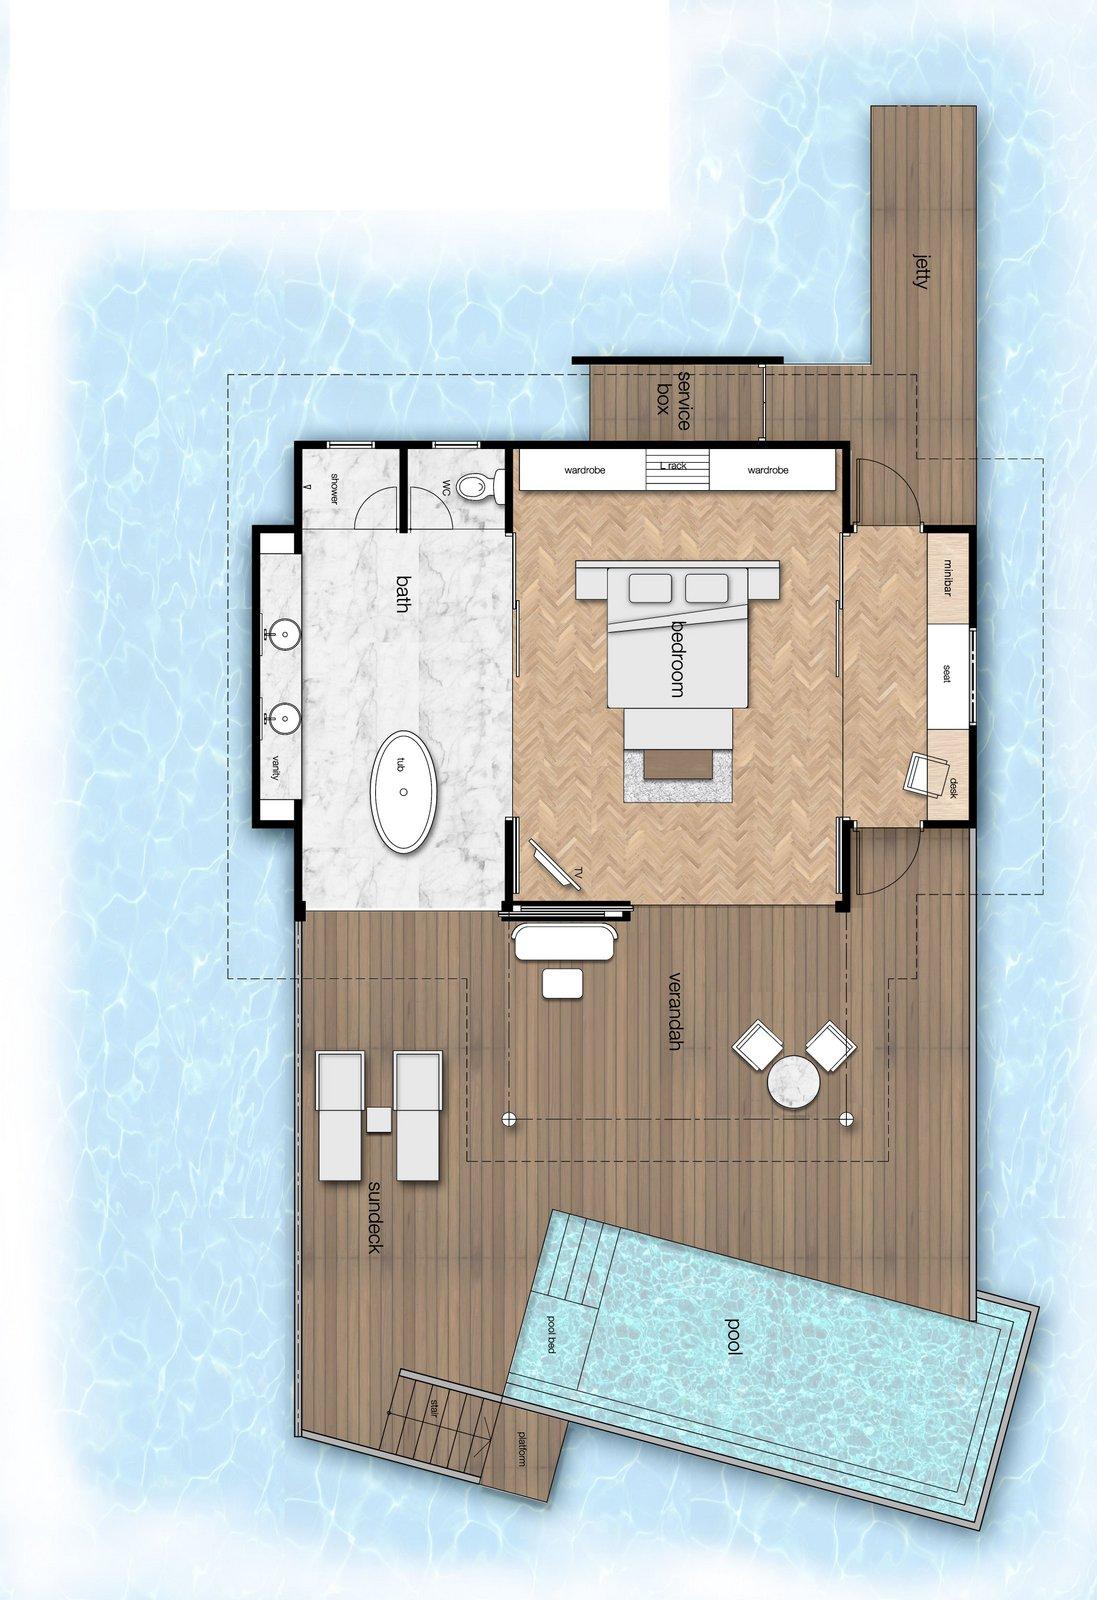 Мальдивы, отель LTI Maafushivaru Maldives, план-схема номера Water Pool Villa